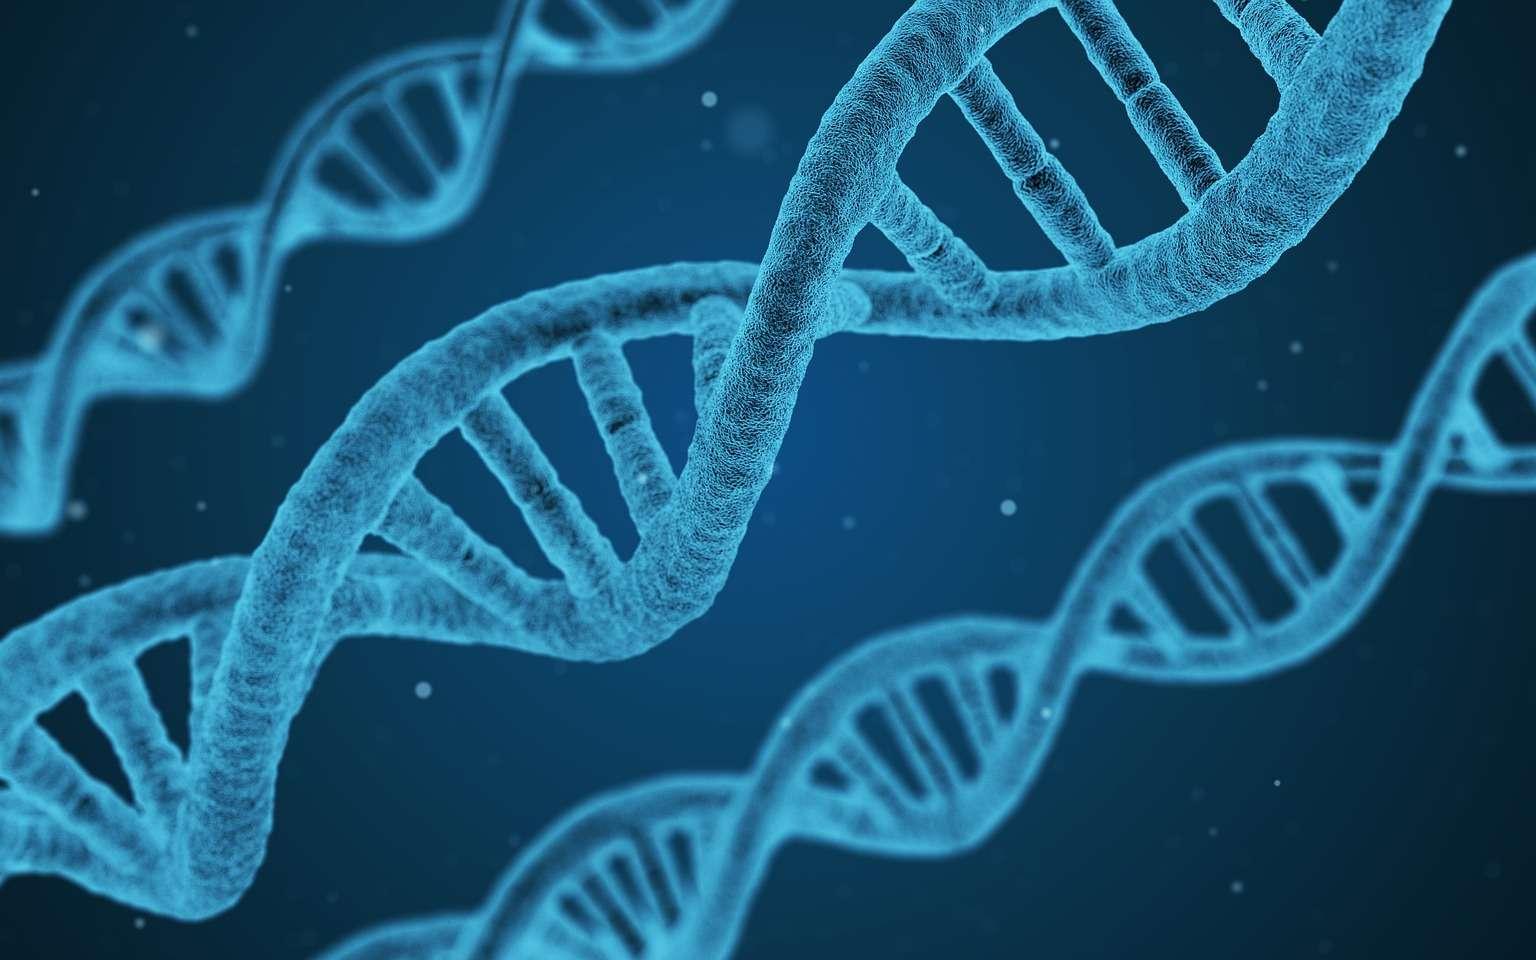 Illustration d'une molécule d'ADN. © Arek Socha, Pixabay